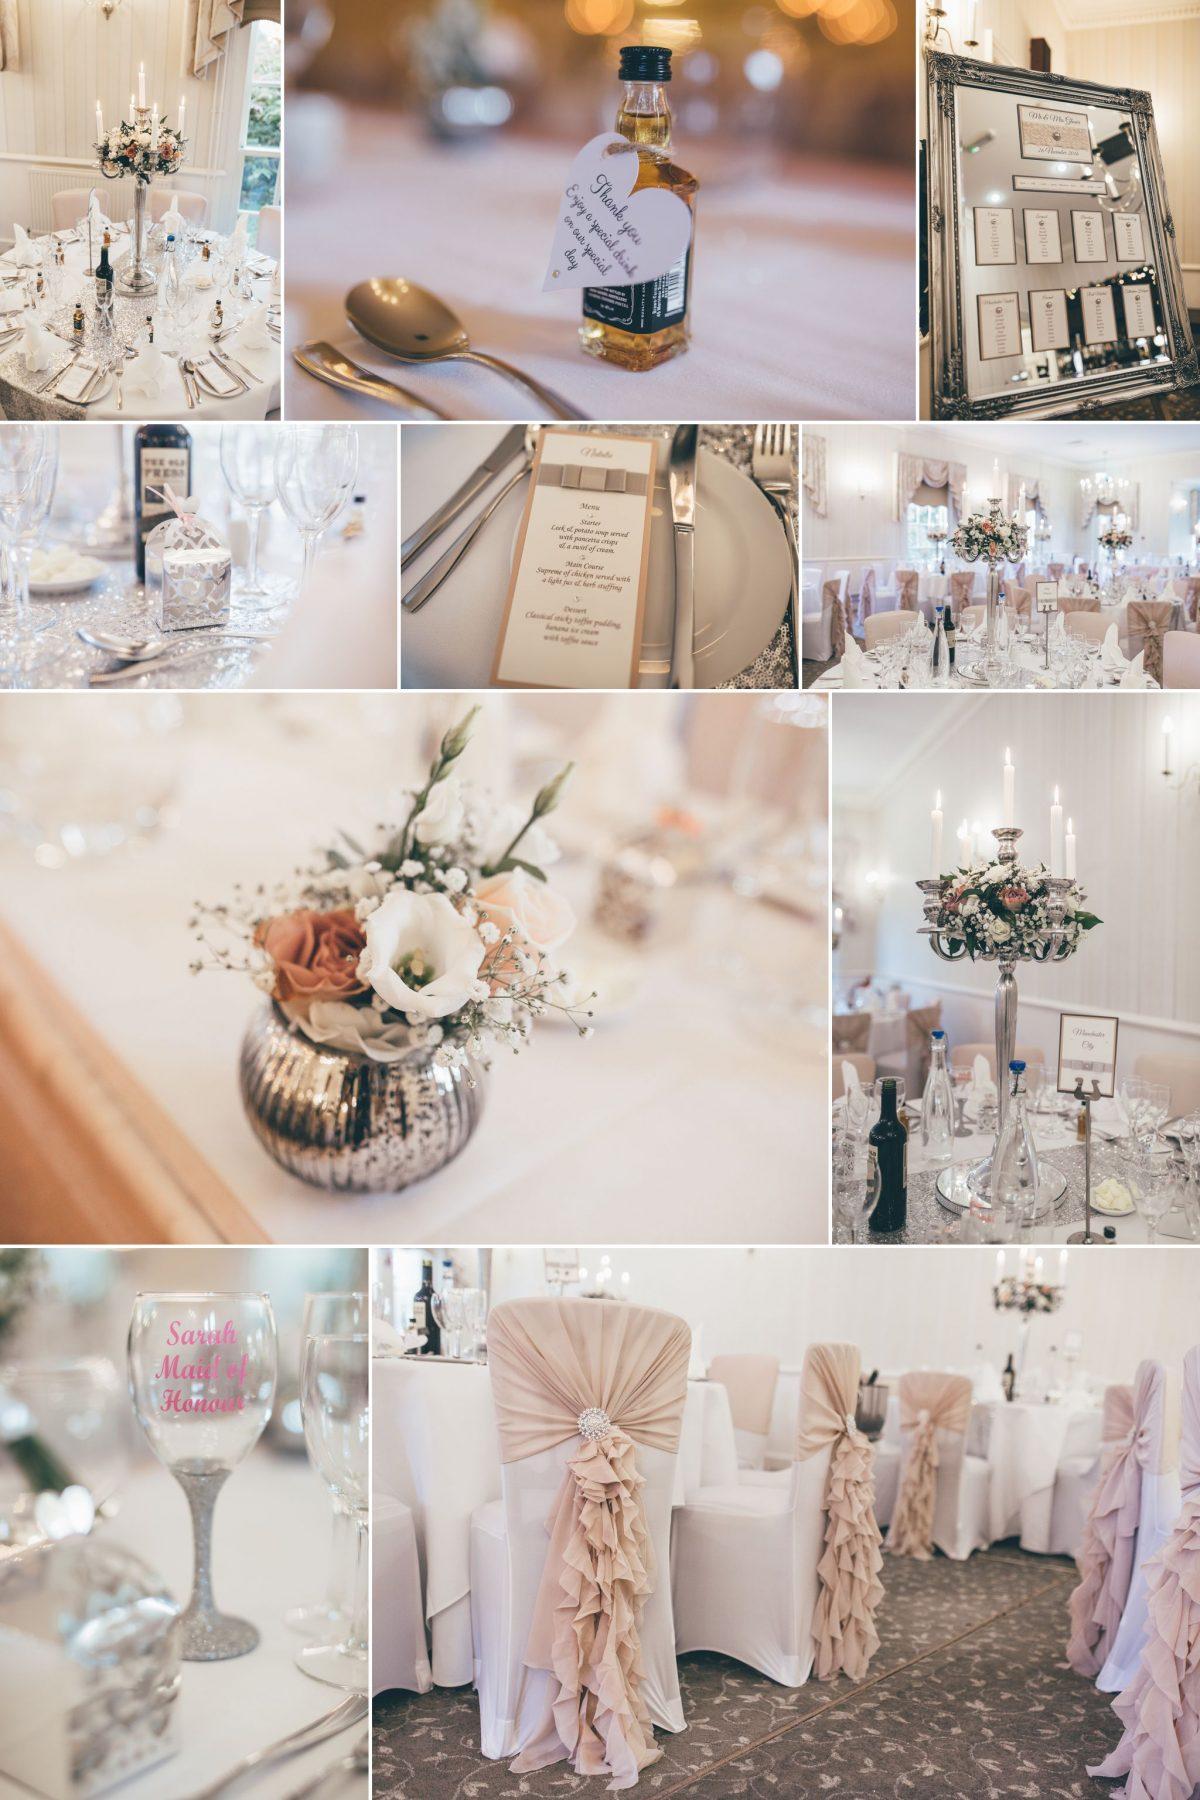 welsh_wedding_photographer_rachel_lambert_photography_decourceys_cardiff_rhiannon_gavin_ 65